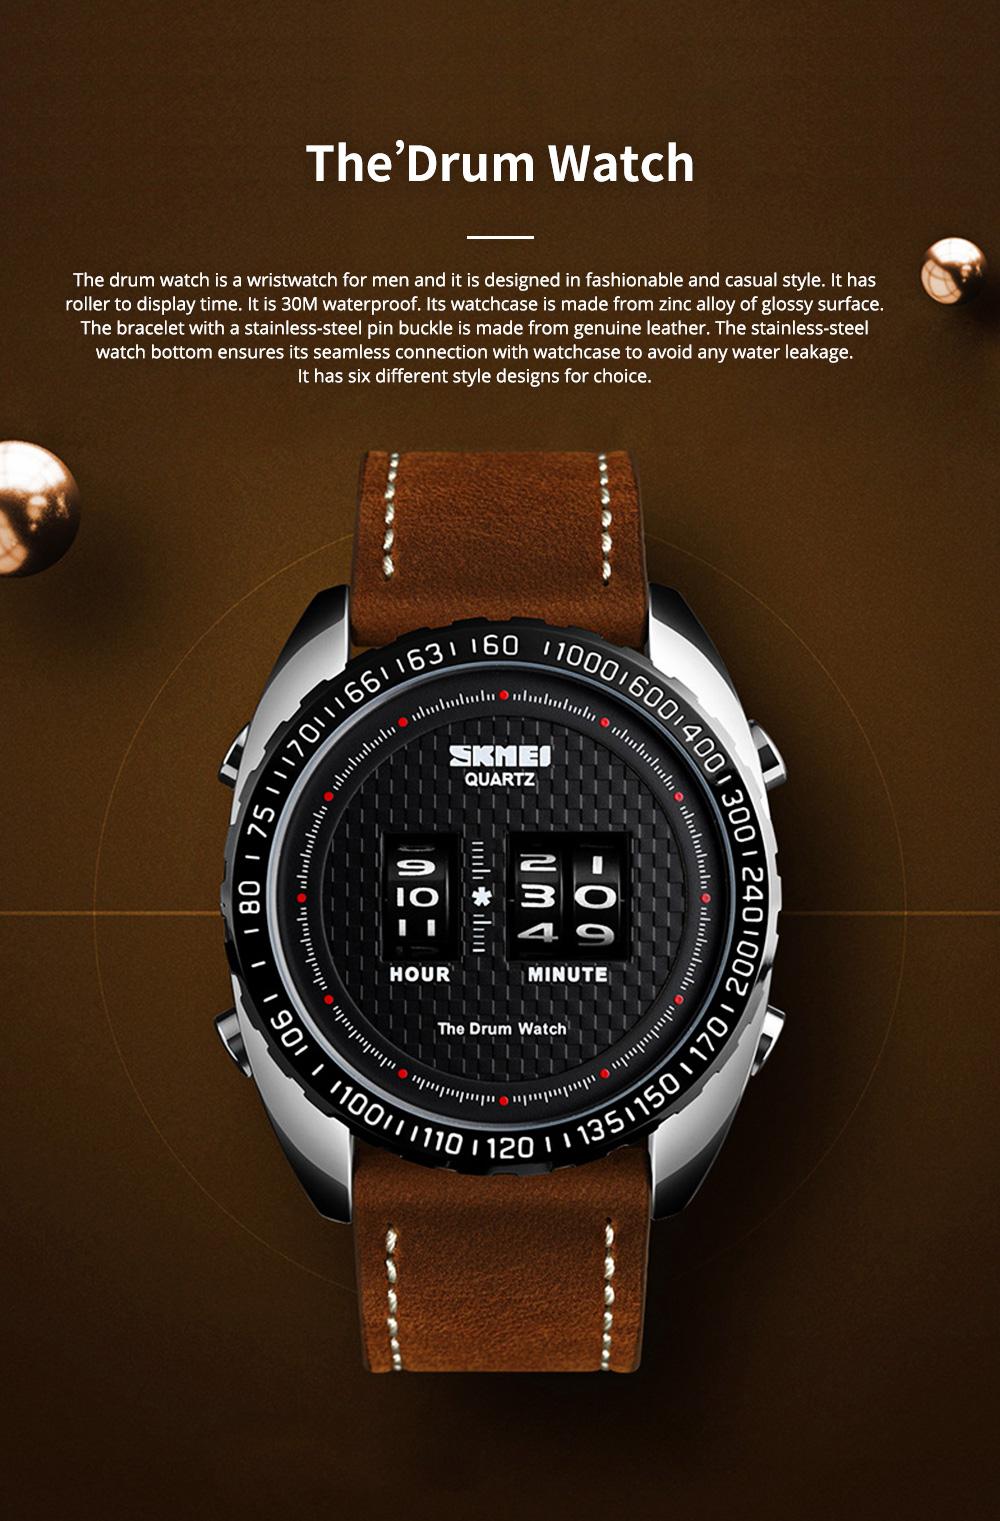 Fashionable Casual Men's Drum Watch with Genuine Leather Bracelet Waterproof Qualified Quartz Movement Wristwatch Round Dial Roller Wrist Watch 0